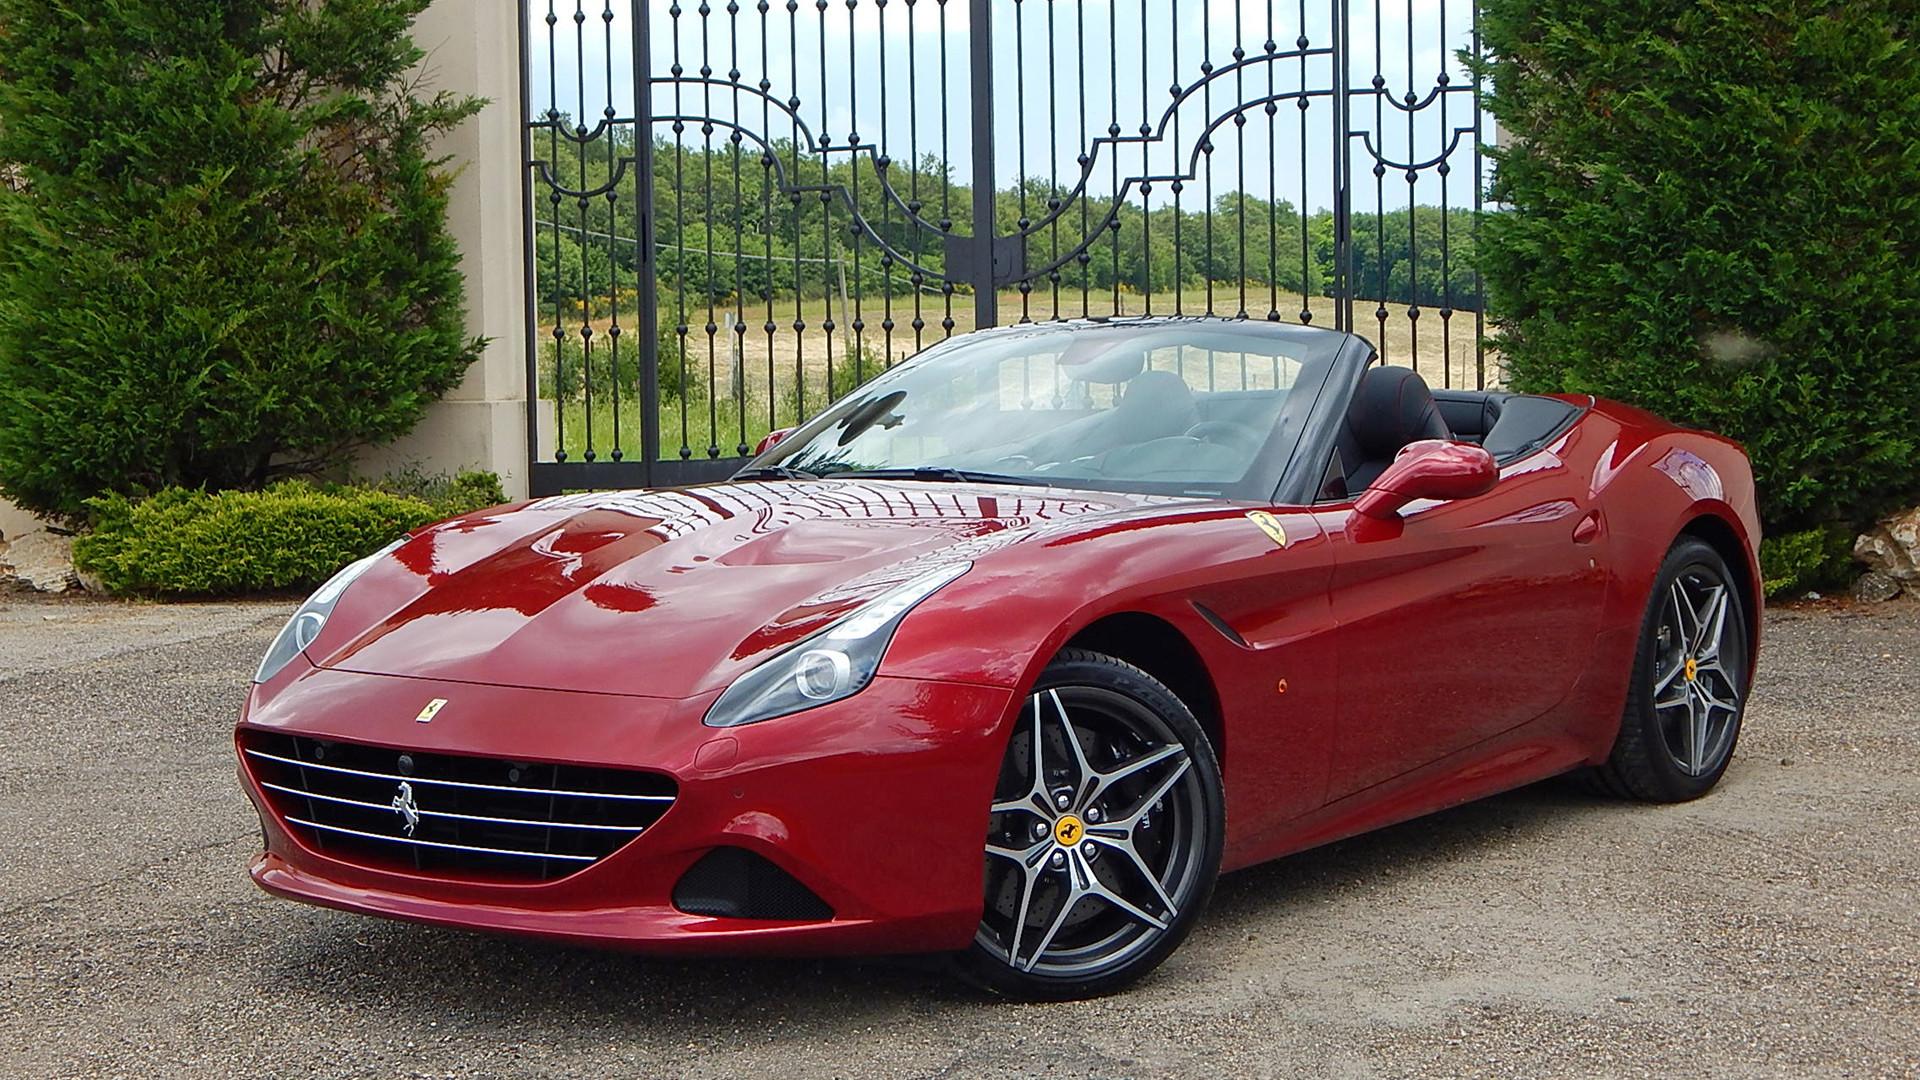 Luxury Car Rental Amp Sports Car Hire In Europe Us Amp Dubai